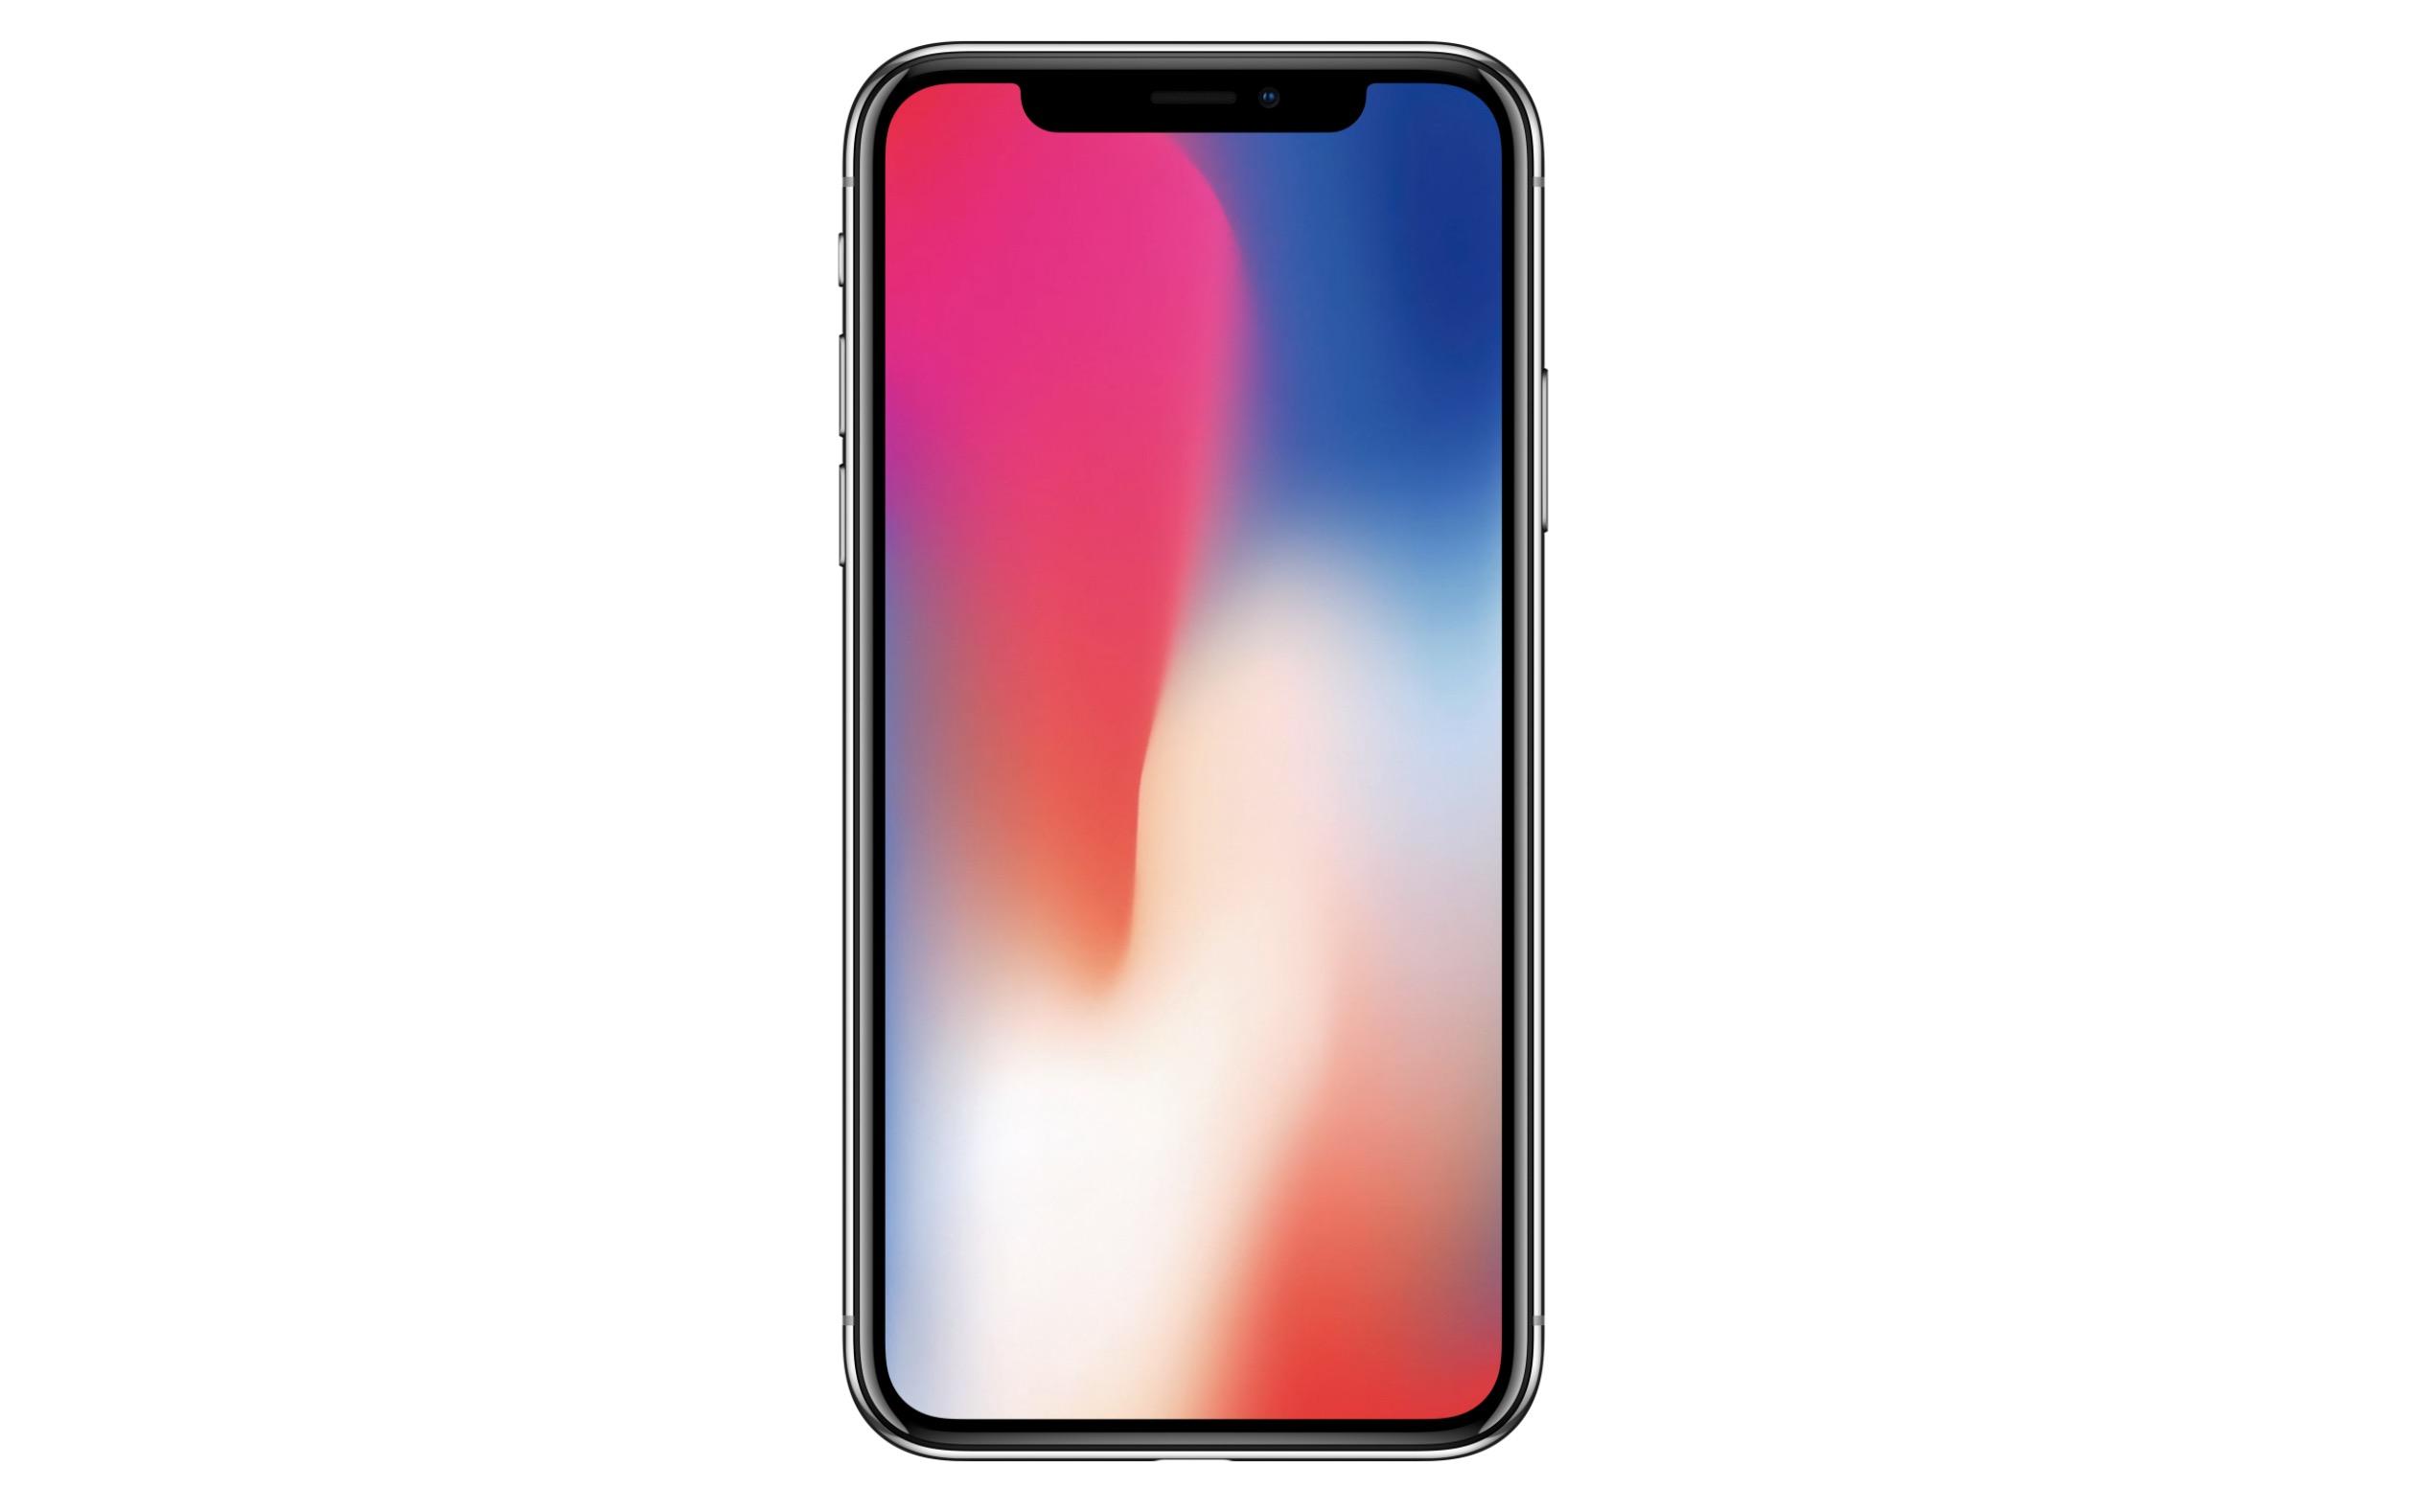 iPhone X prezzo